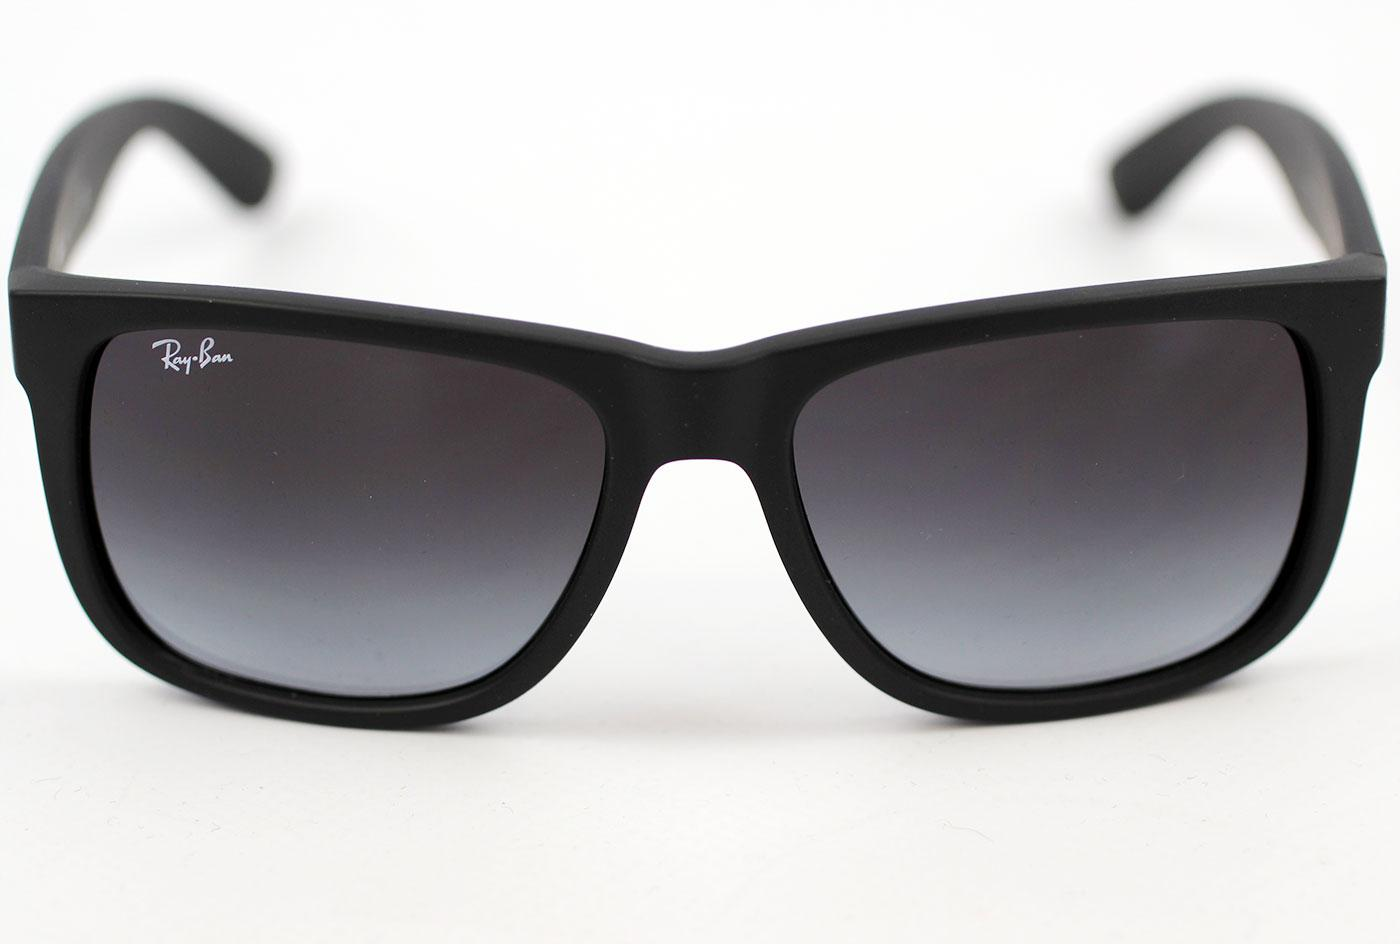 Ray-Ban Justin RB4165 Retro Wayfarer Sunglasses B